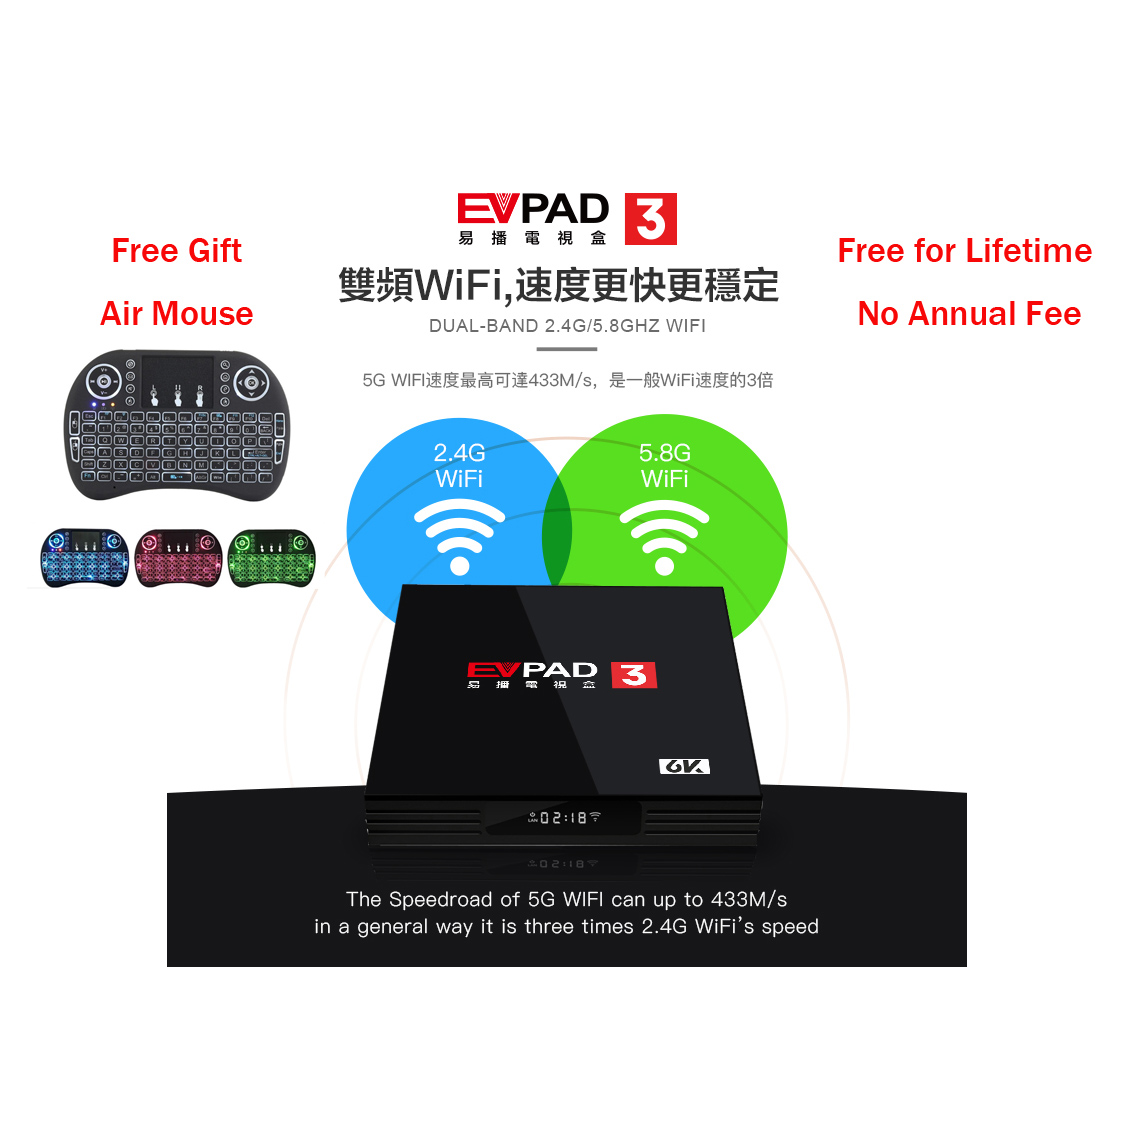 EVPAD 3 3S 3Plus 3Max Android tv box Free Keypad IPTV Chinese Korea Japan Taiwan Singapore